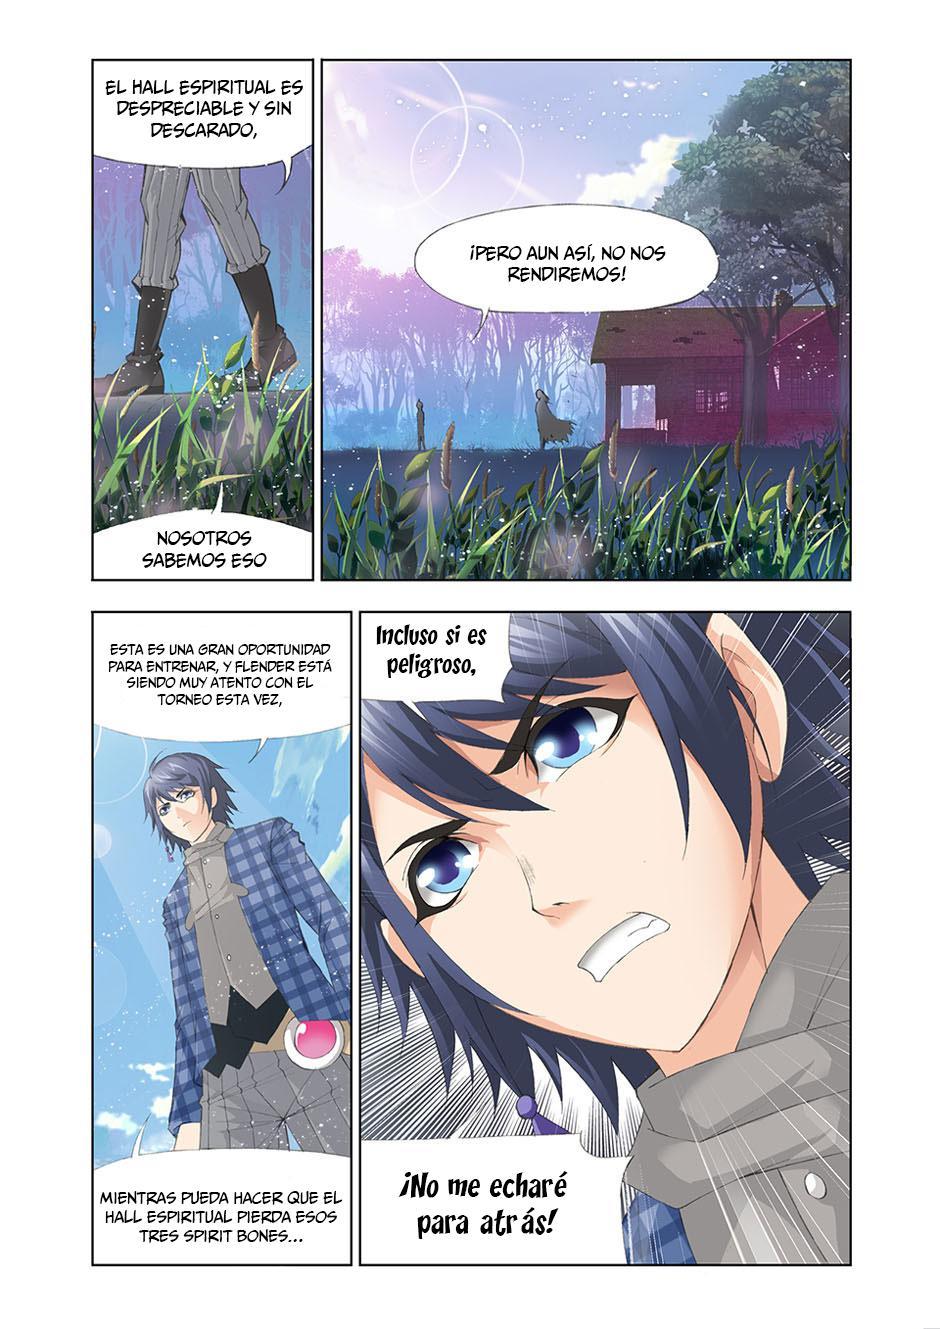 https://c5.ninemanga.com/es_manga/18/16210/417006/bdbd5ebfde4934142c8a88e7a3796cd5.jpg Page 9